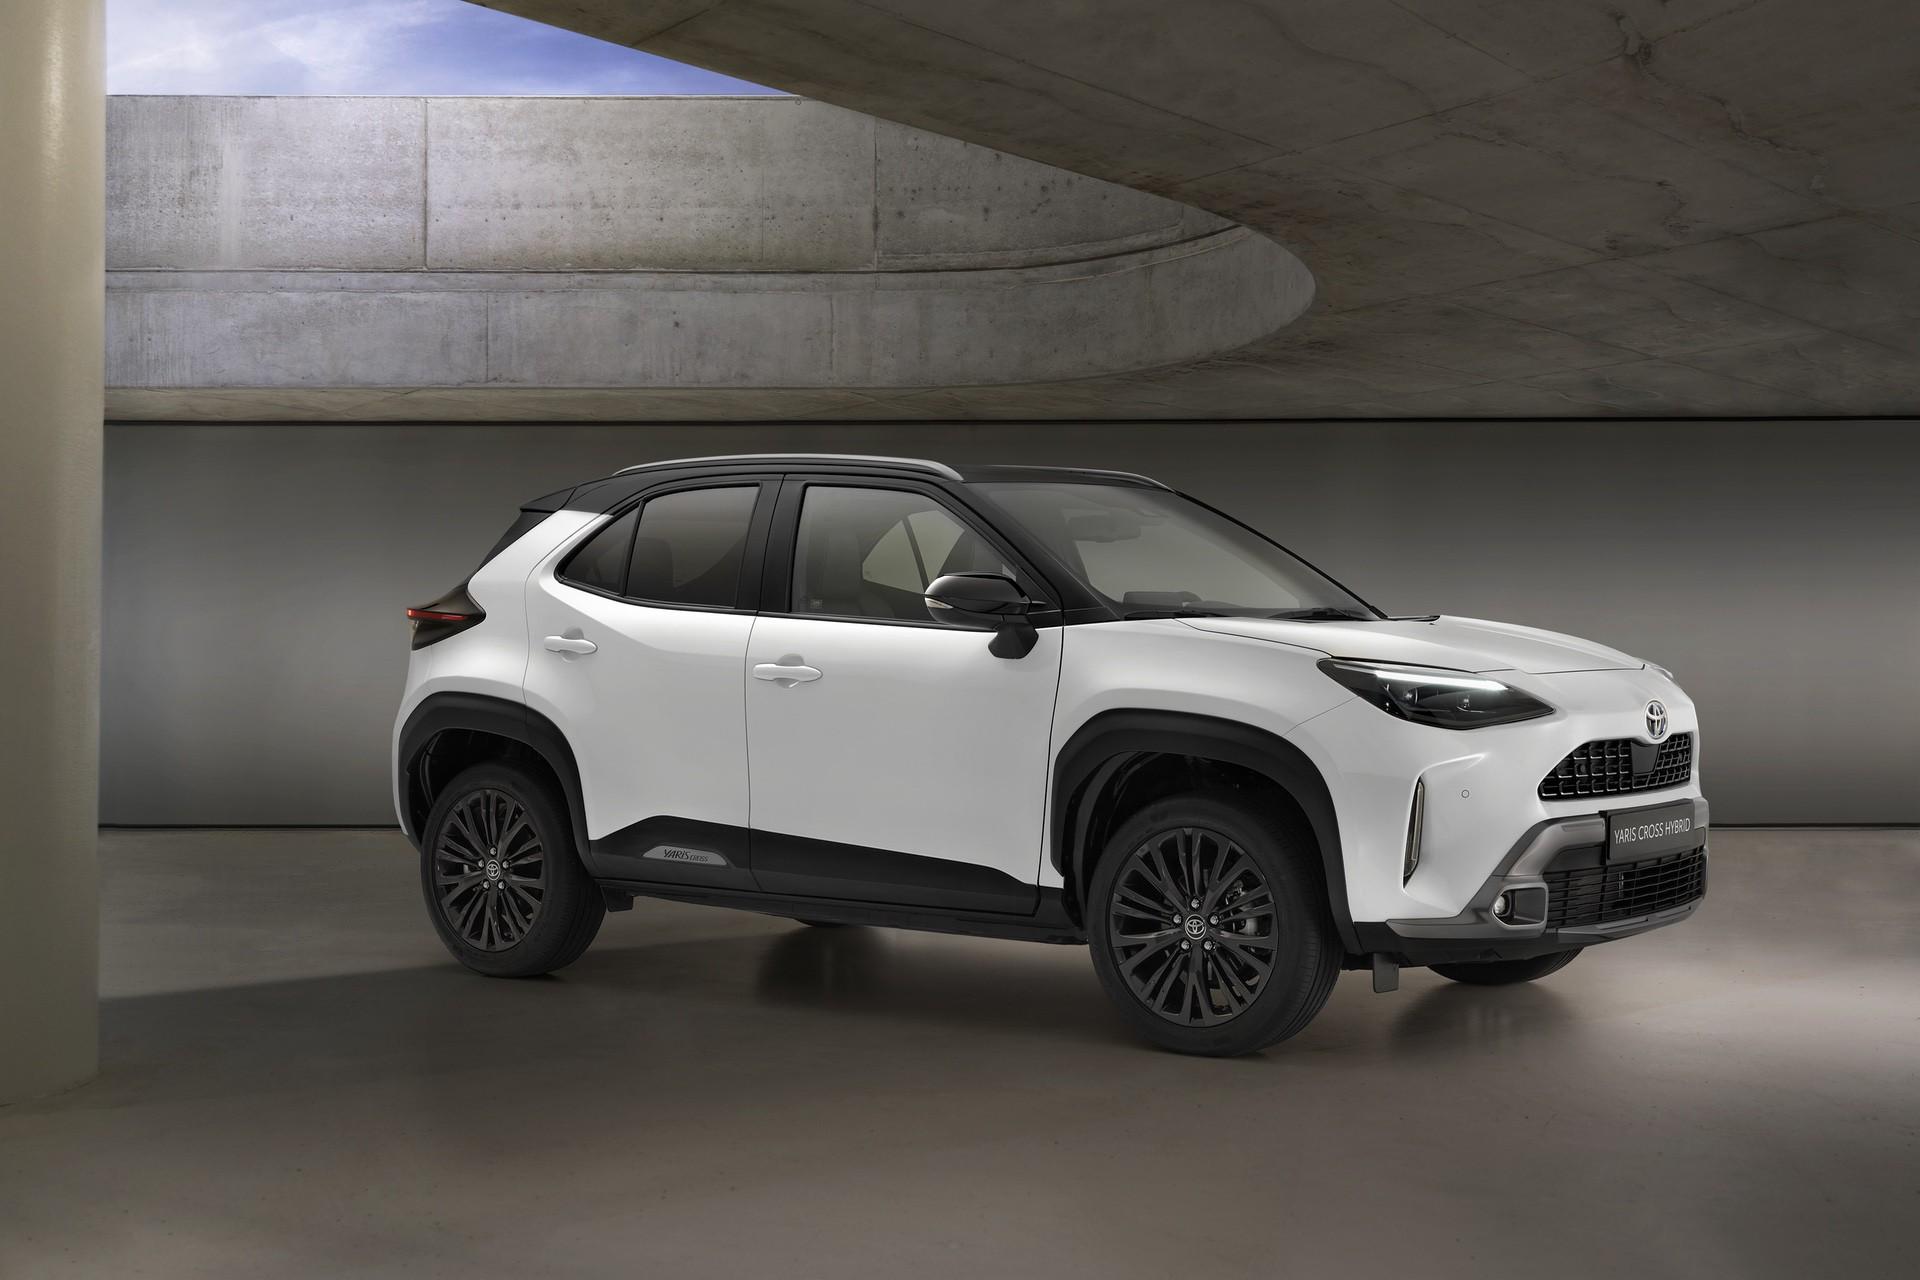 Toyota_Yaris_Cross_Adventure-0004